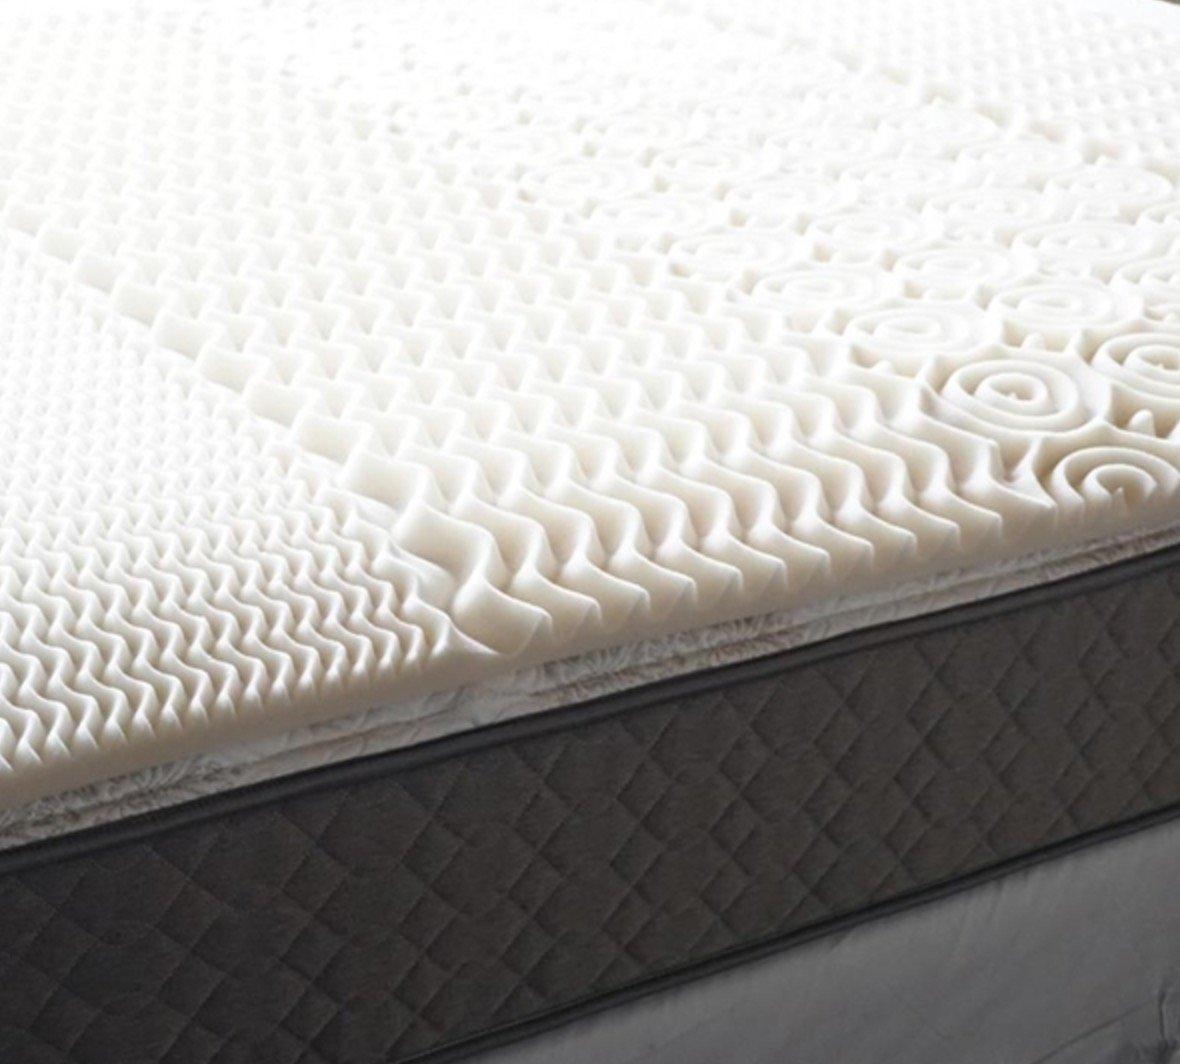 Amazon.com: 5 Zone Egg Crate Memory Foam Twin XL Topper: Home & Kitchen